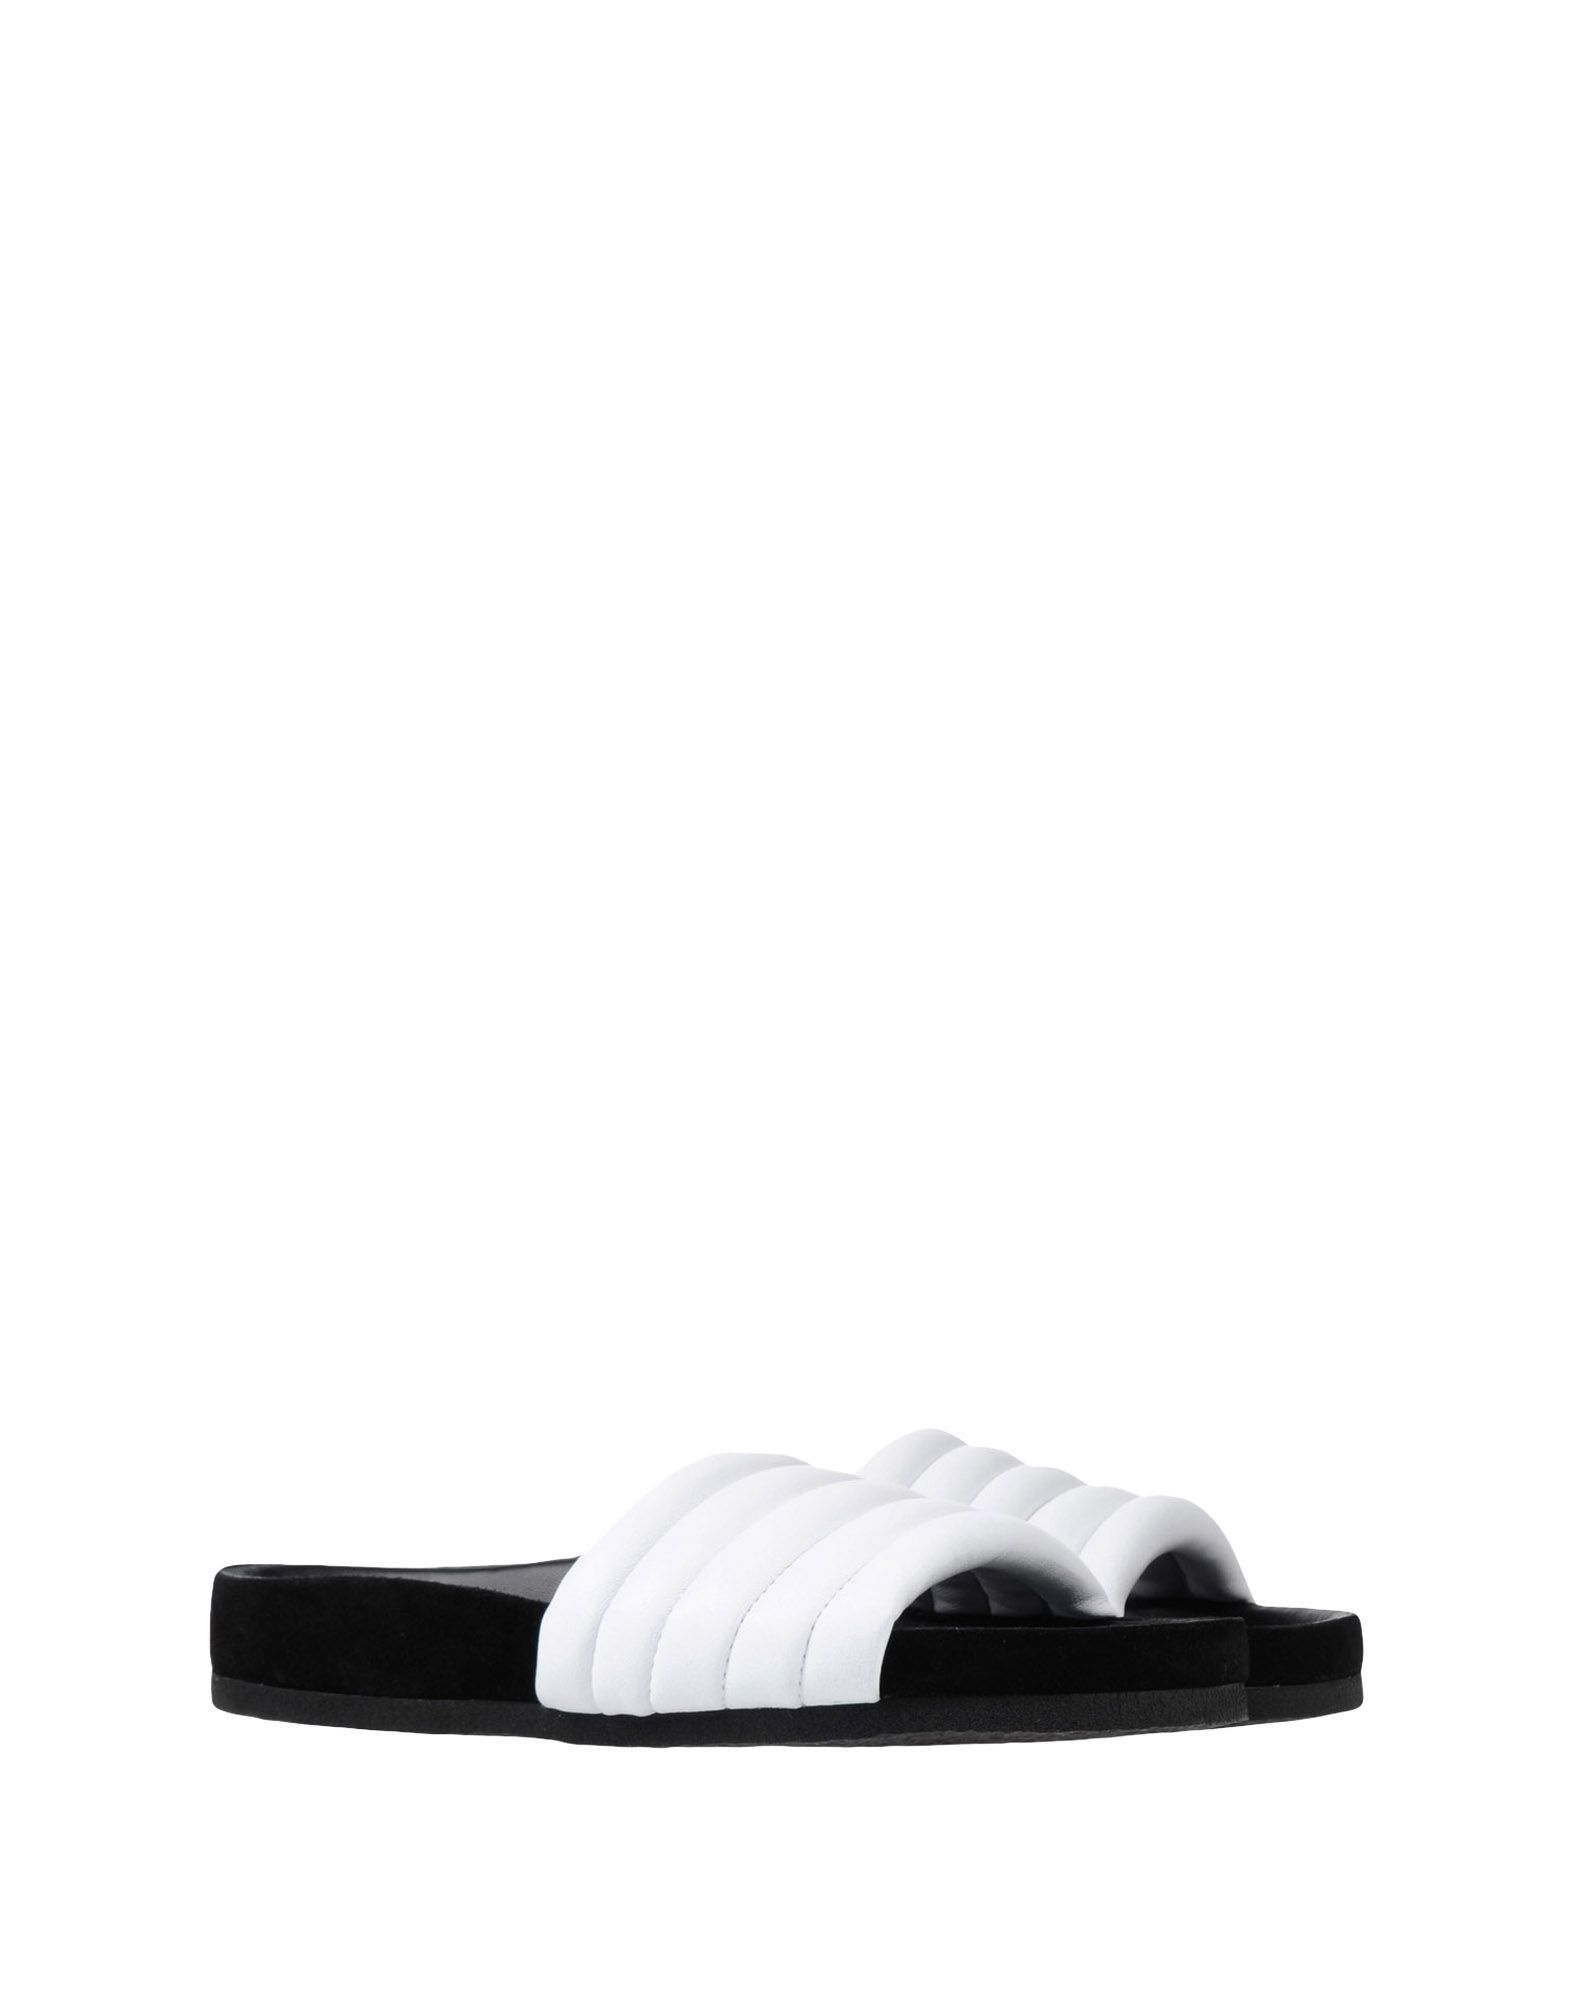 Isabel Marant Sandalen Damen  11459514VSGut aussehende aussehende aussehende strapazierfähige Schuhe 4edc46